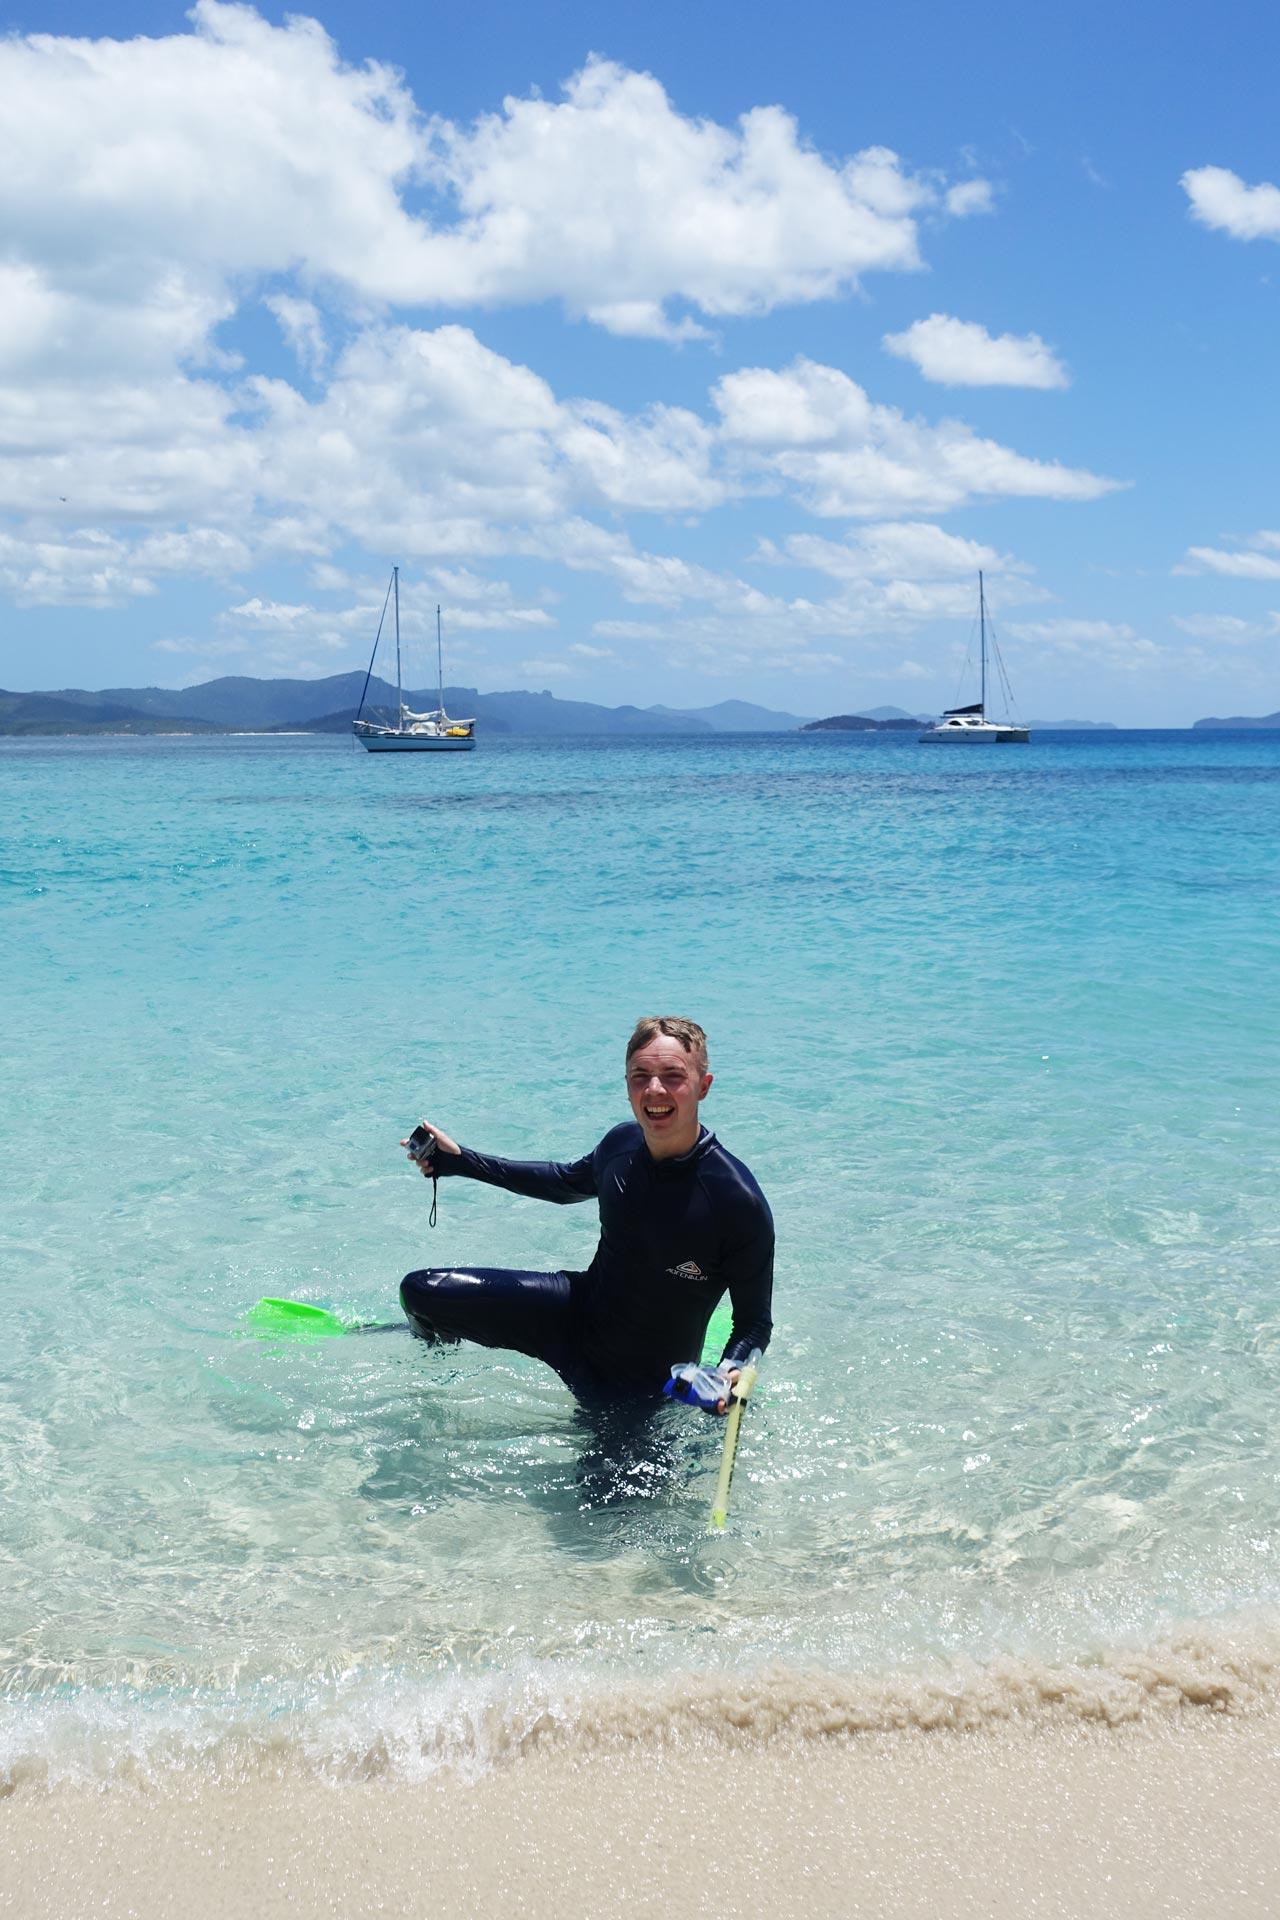 Mattias snorkelling at Chalkies Beach